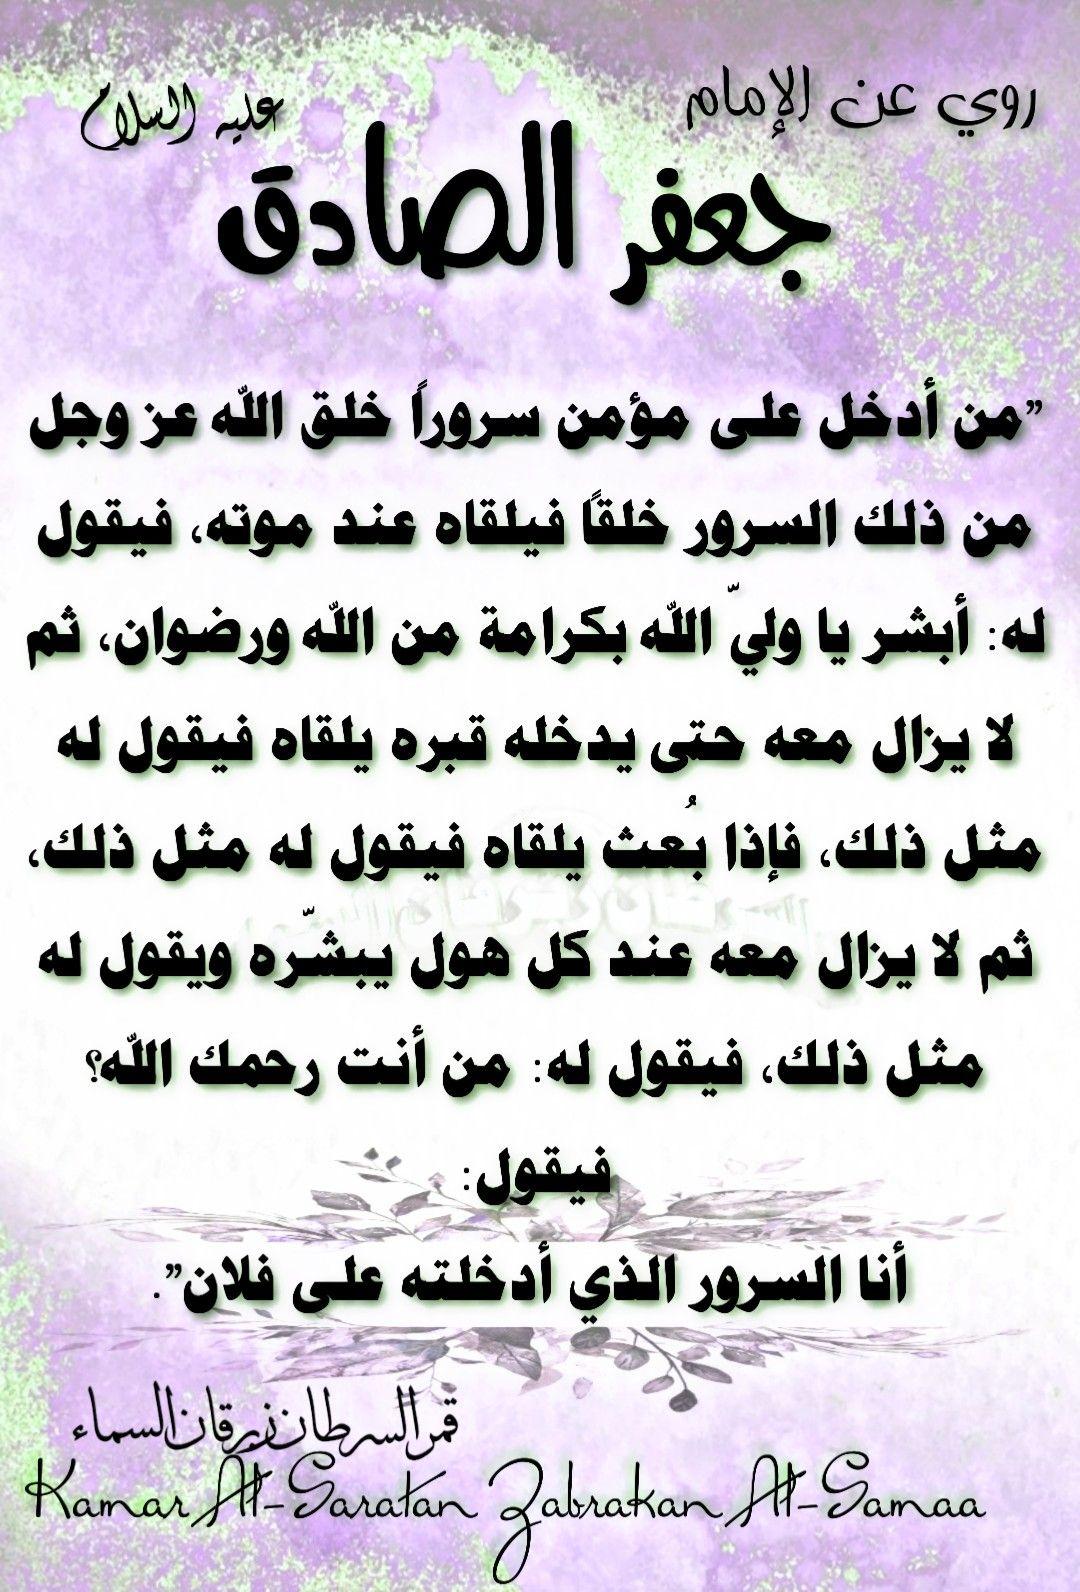 Pin By صياح الحمصي On الإمام جعفر الصادق عليه السلام Islamic Phrases Phrase Wisdom